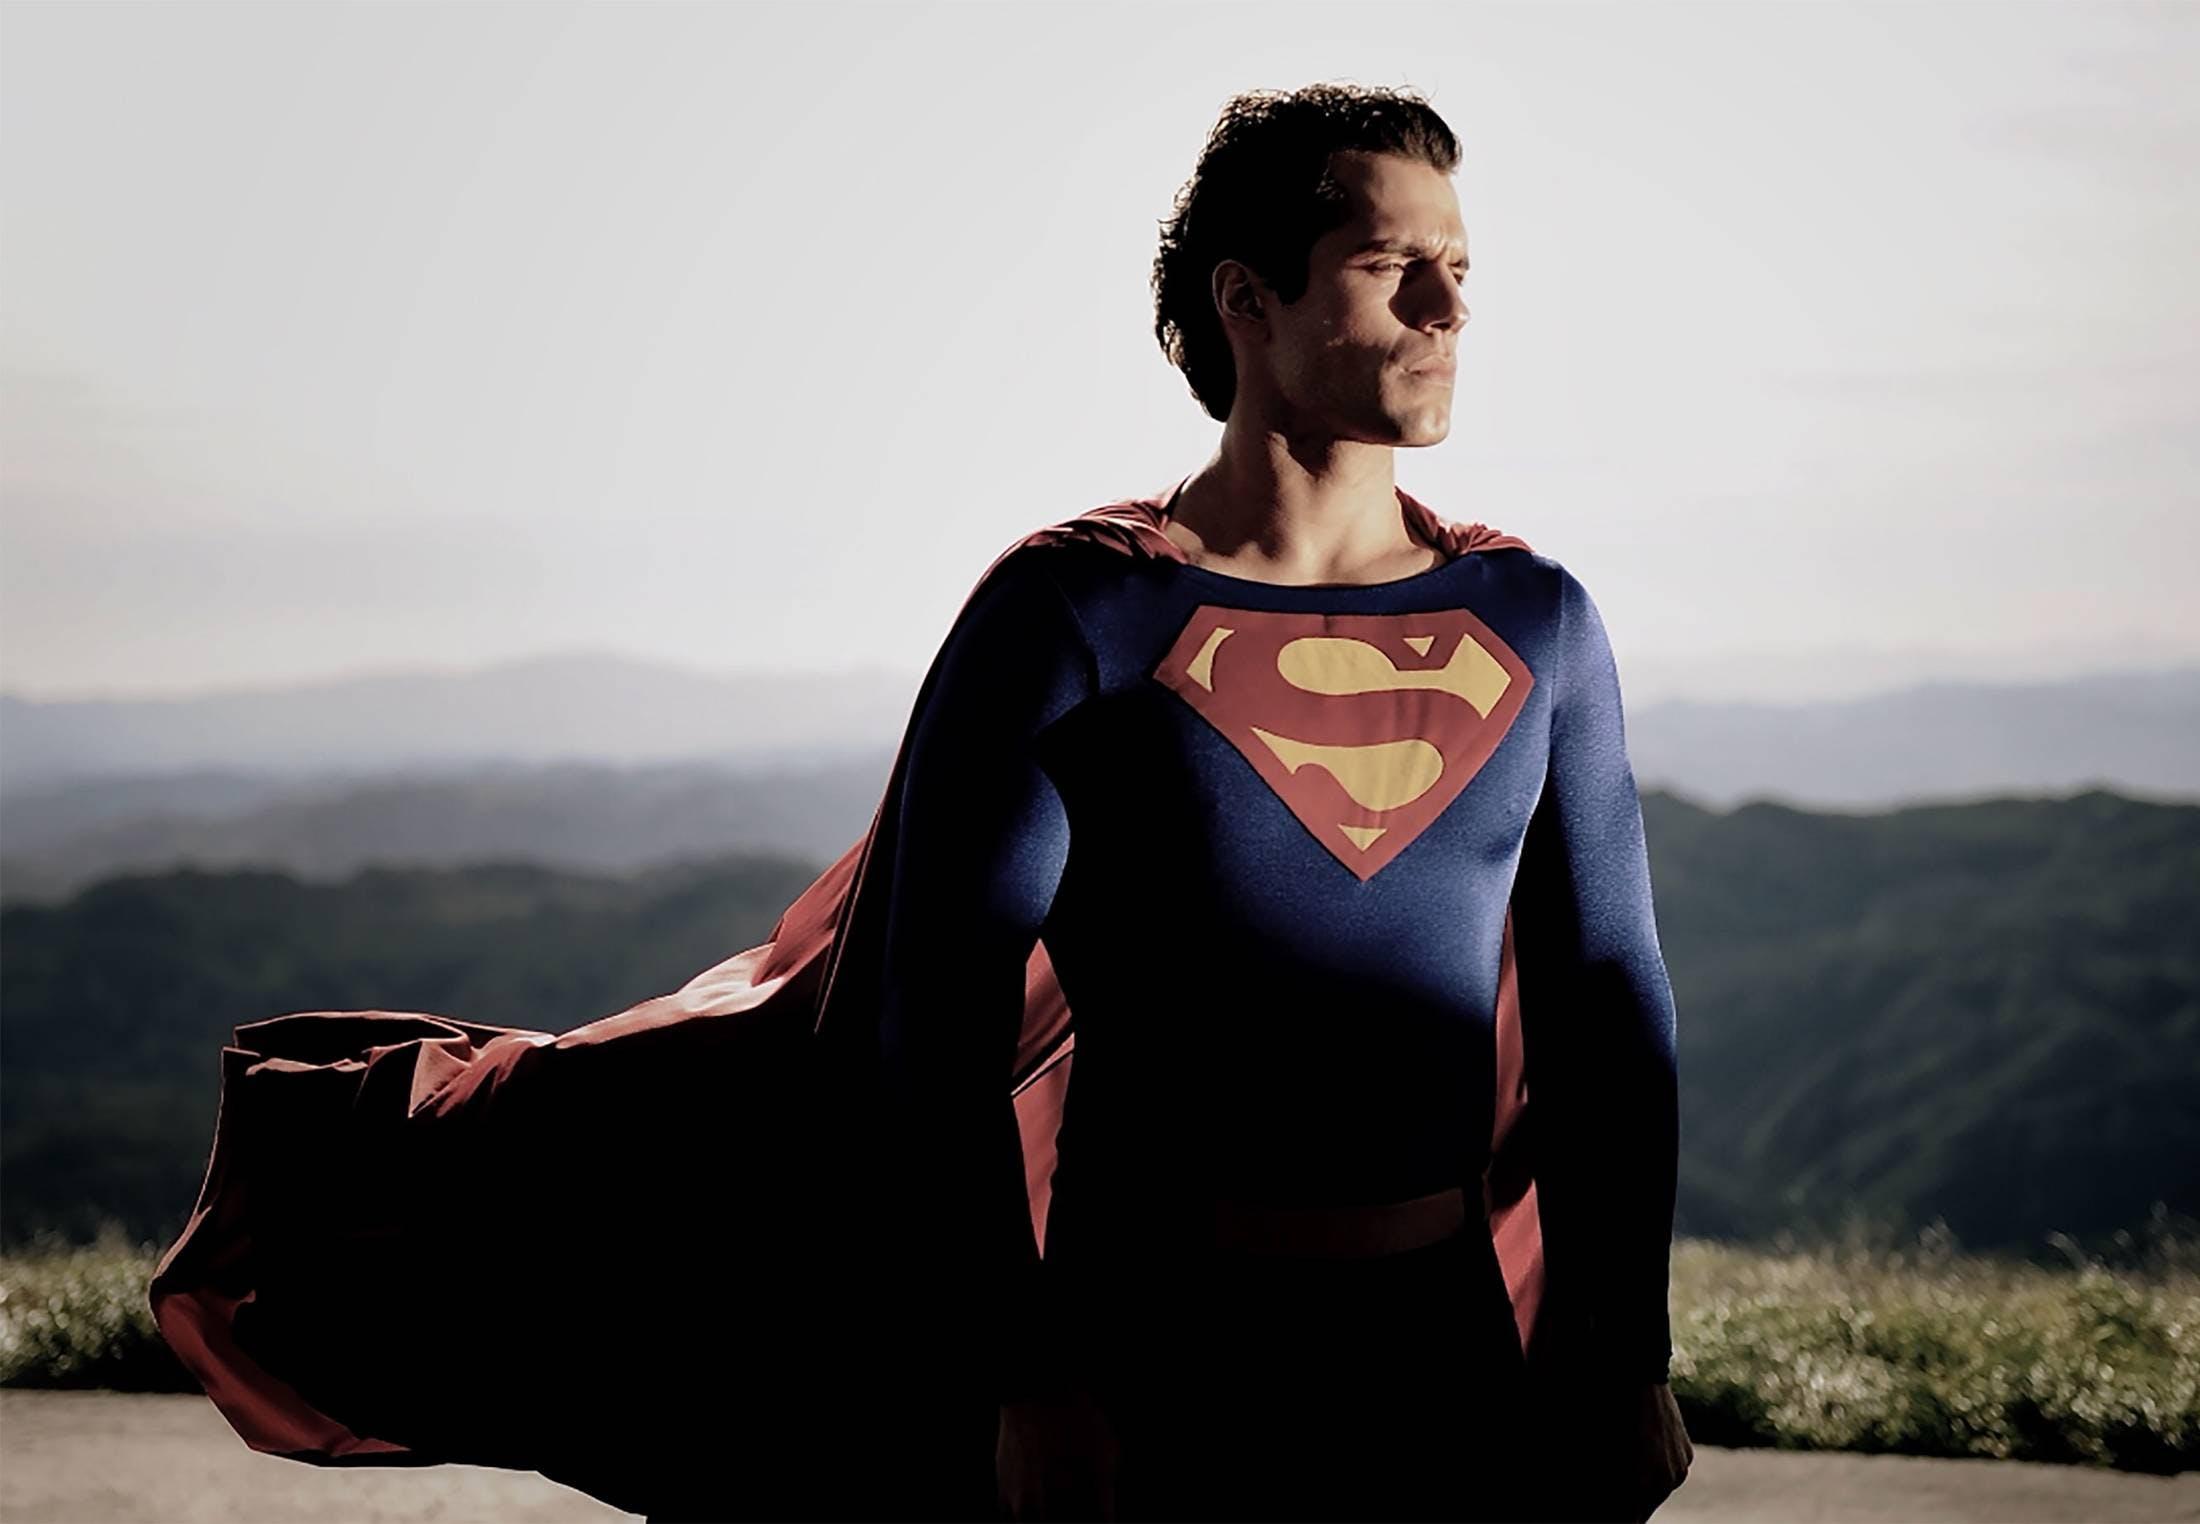 Cavil in Reeve's Superman Suit